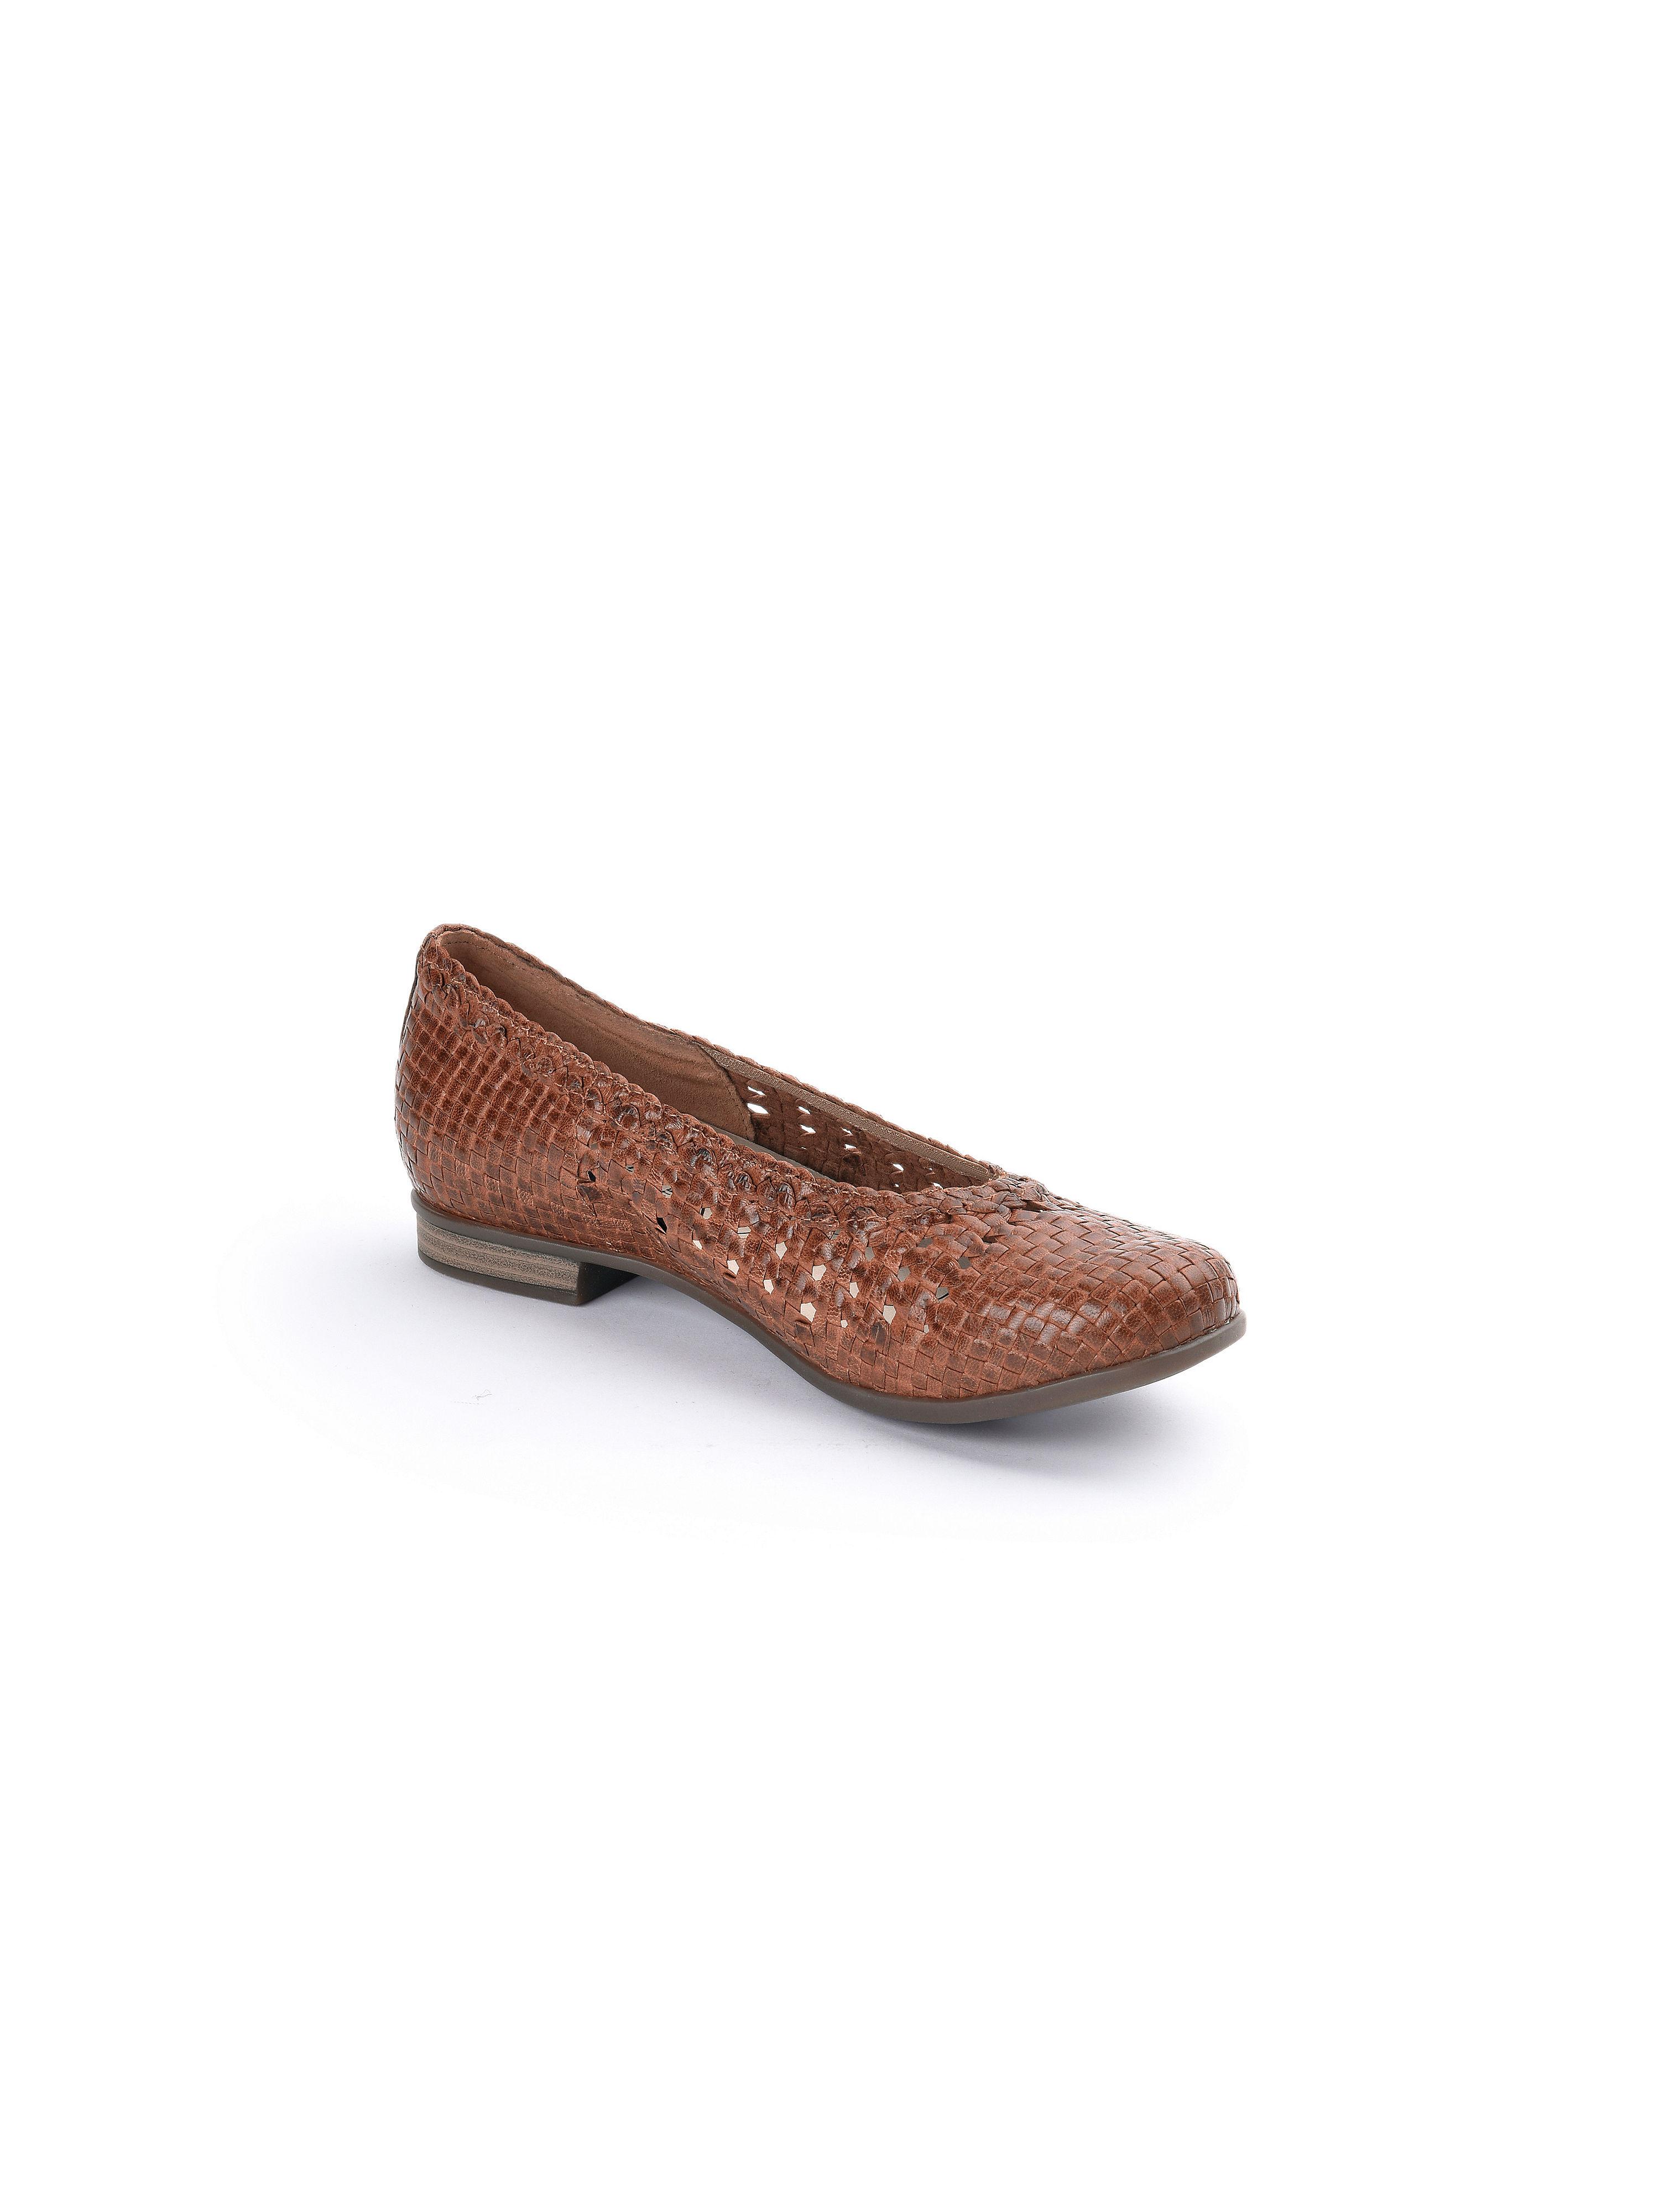 "Waldläufer - Flecht-Ballerina ""Hamiki"" - Cognac Gute Qualität beliebte Schuhe"